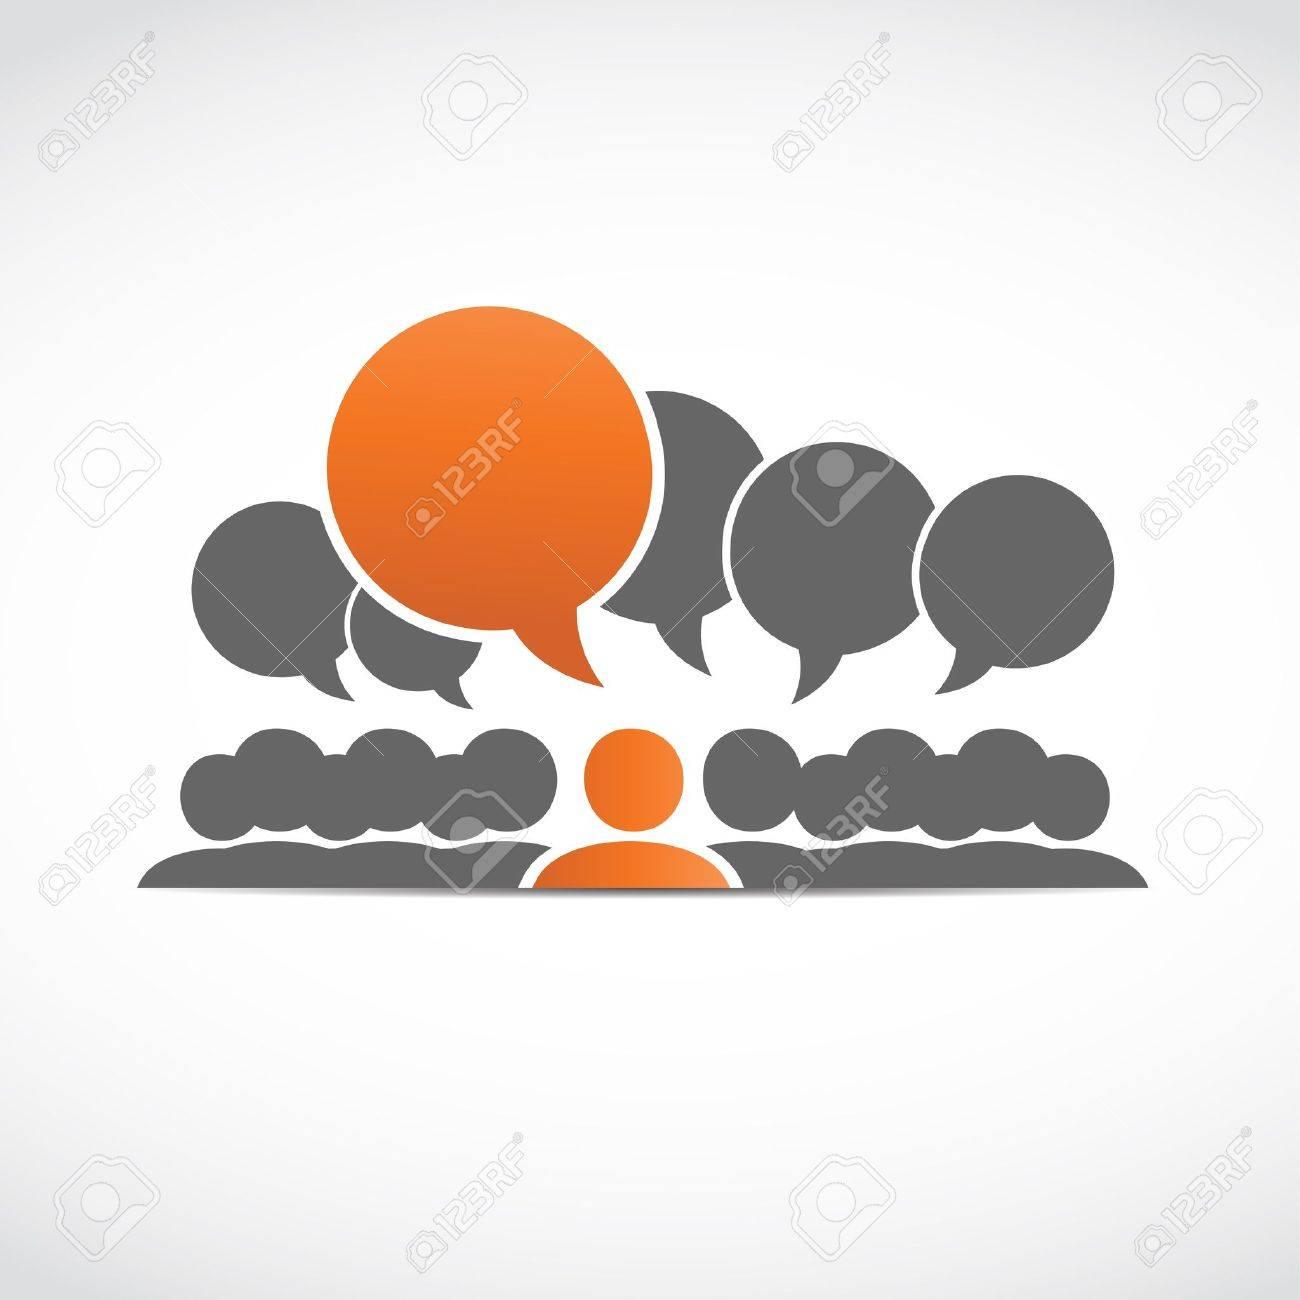 social connections Stock Vector - 15600610